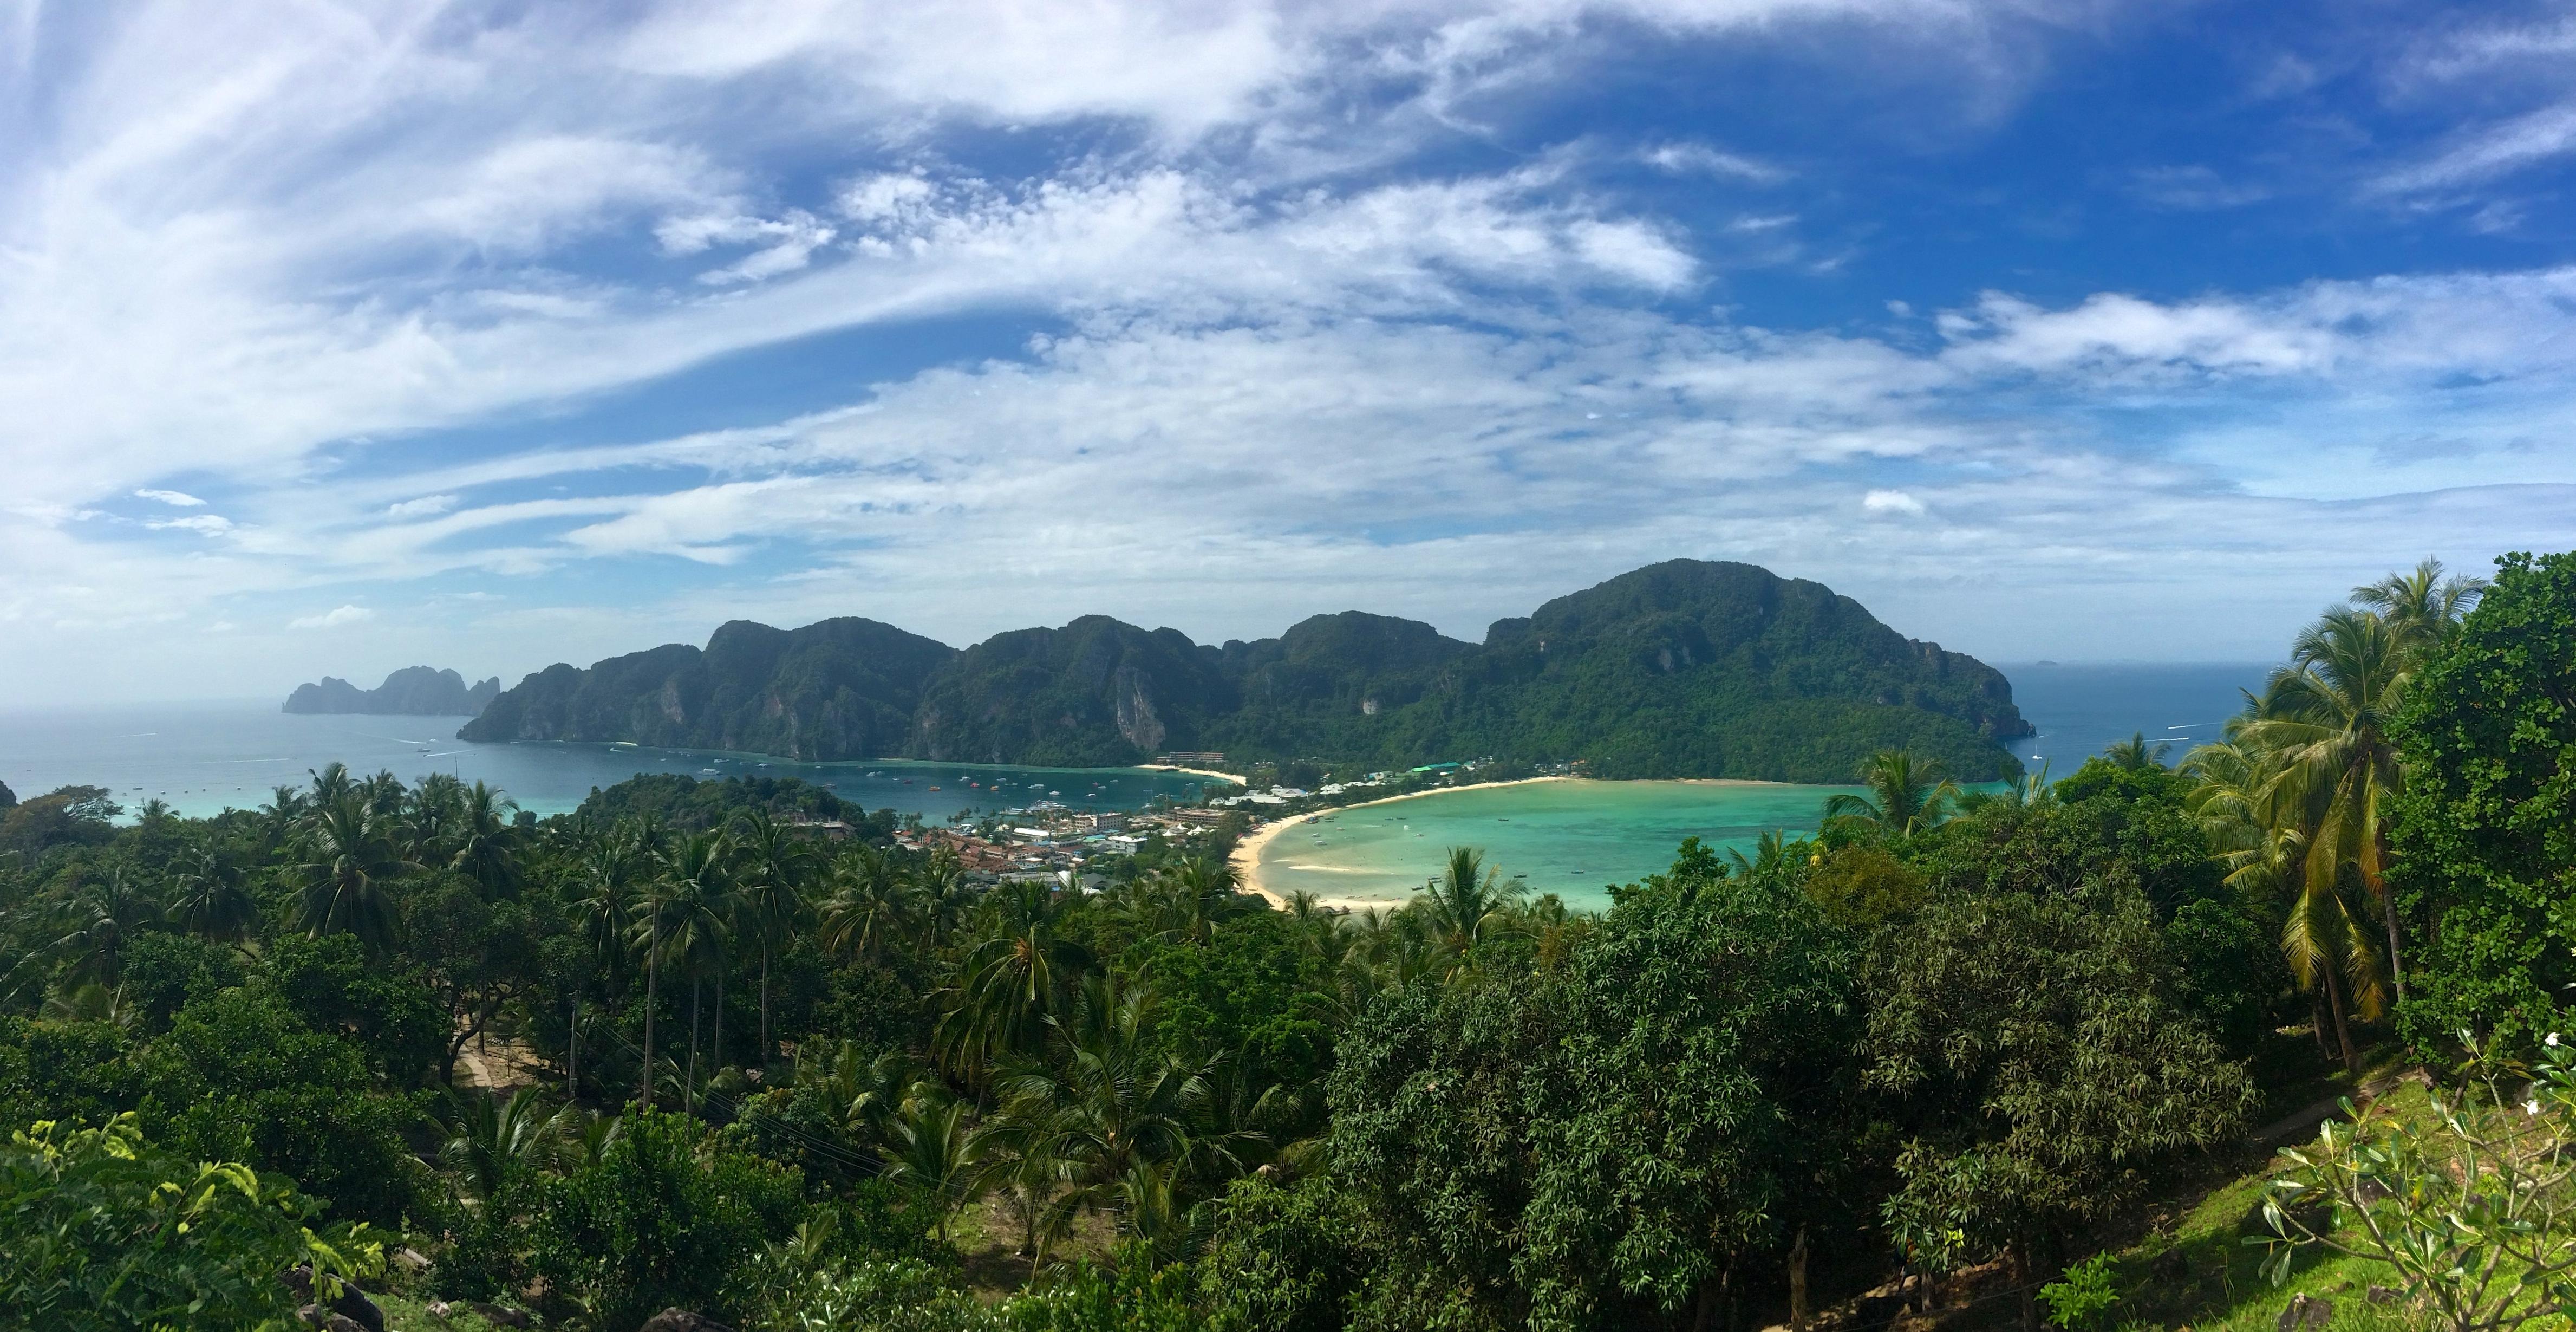 Viewpoint - Koh Phi Phi